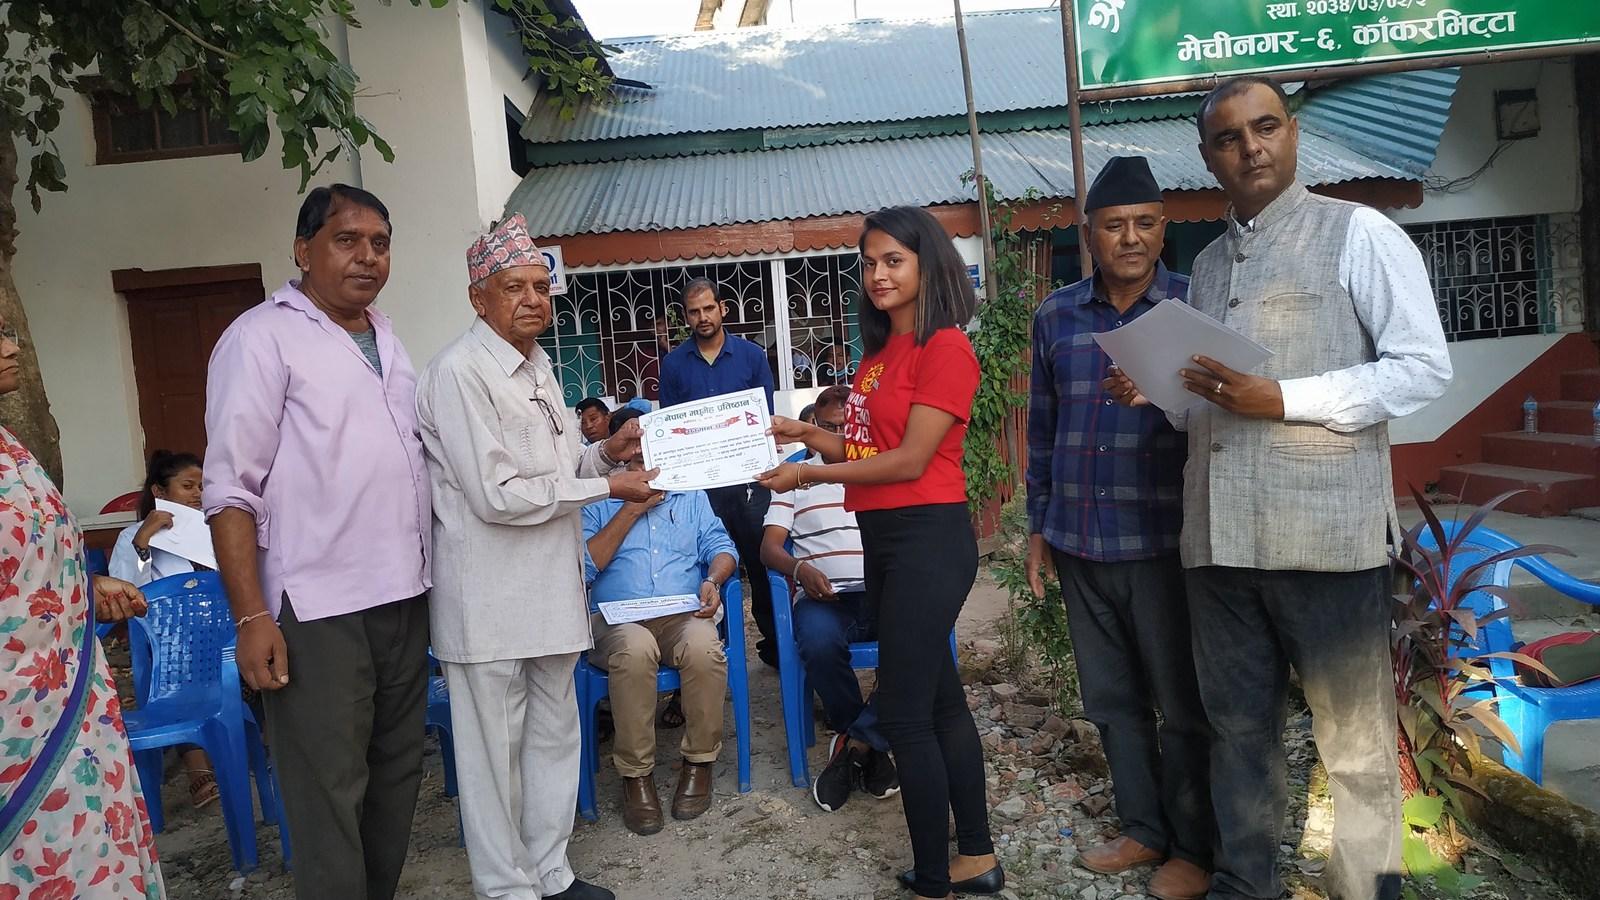 Diabetes Eye Screening Health Camp On 29th World Diabetes Day Rotary Club Of Kakarvitta 6